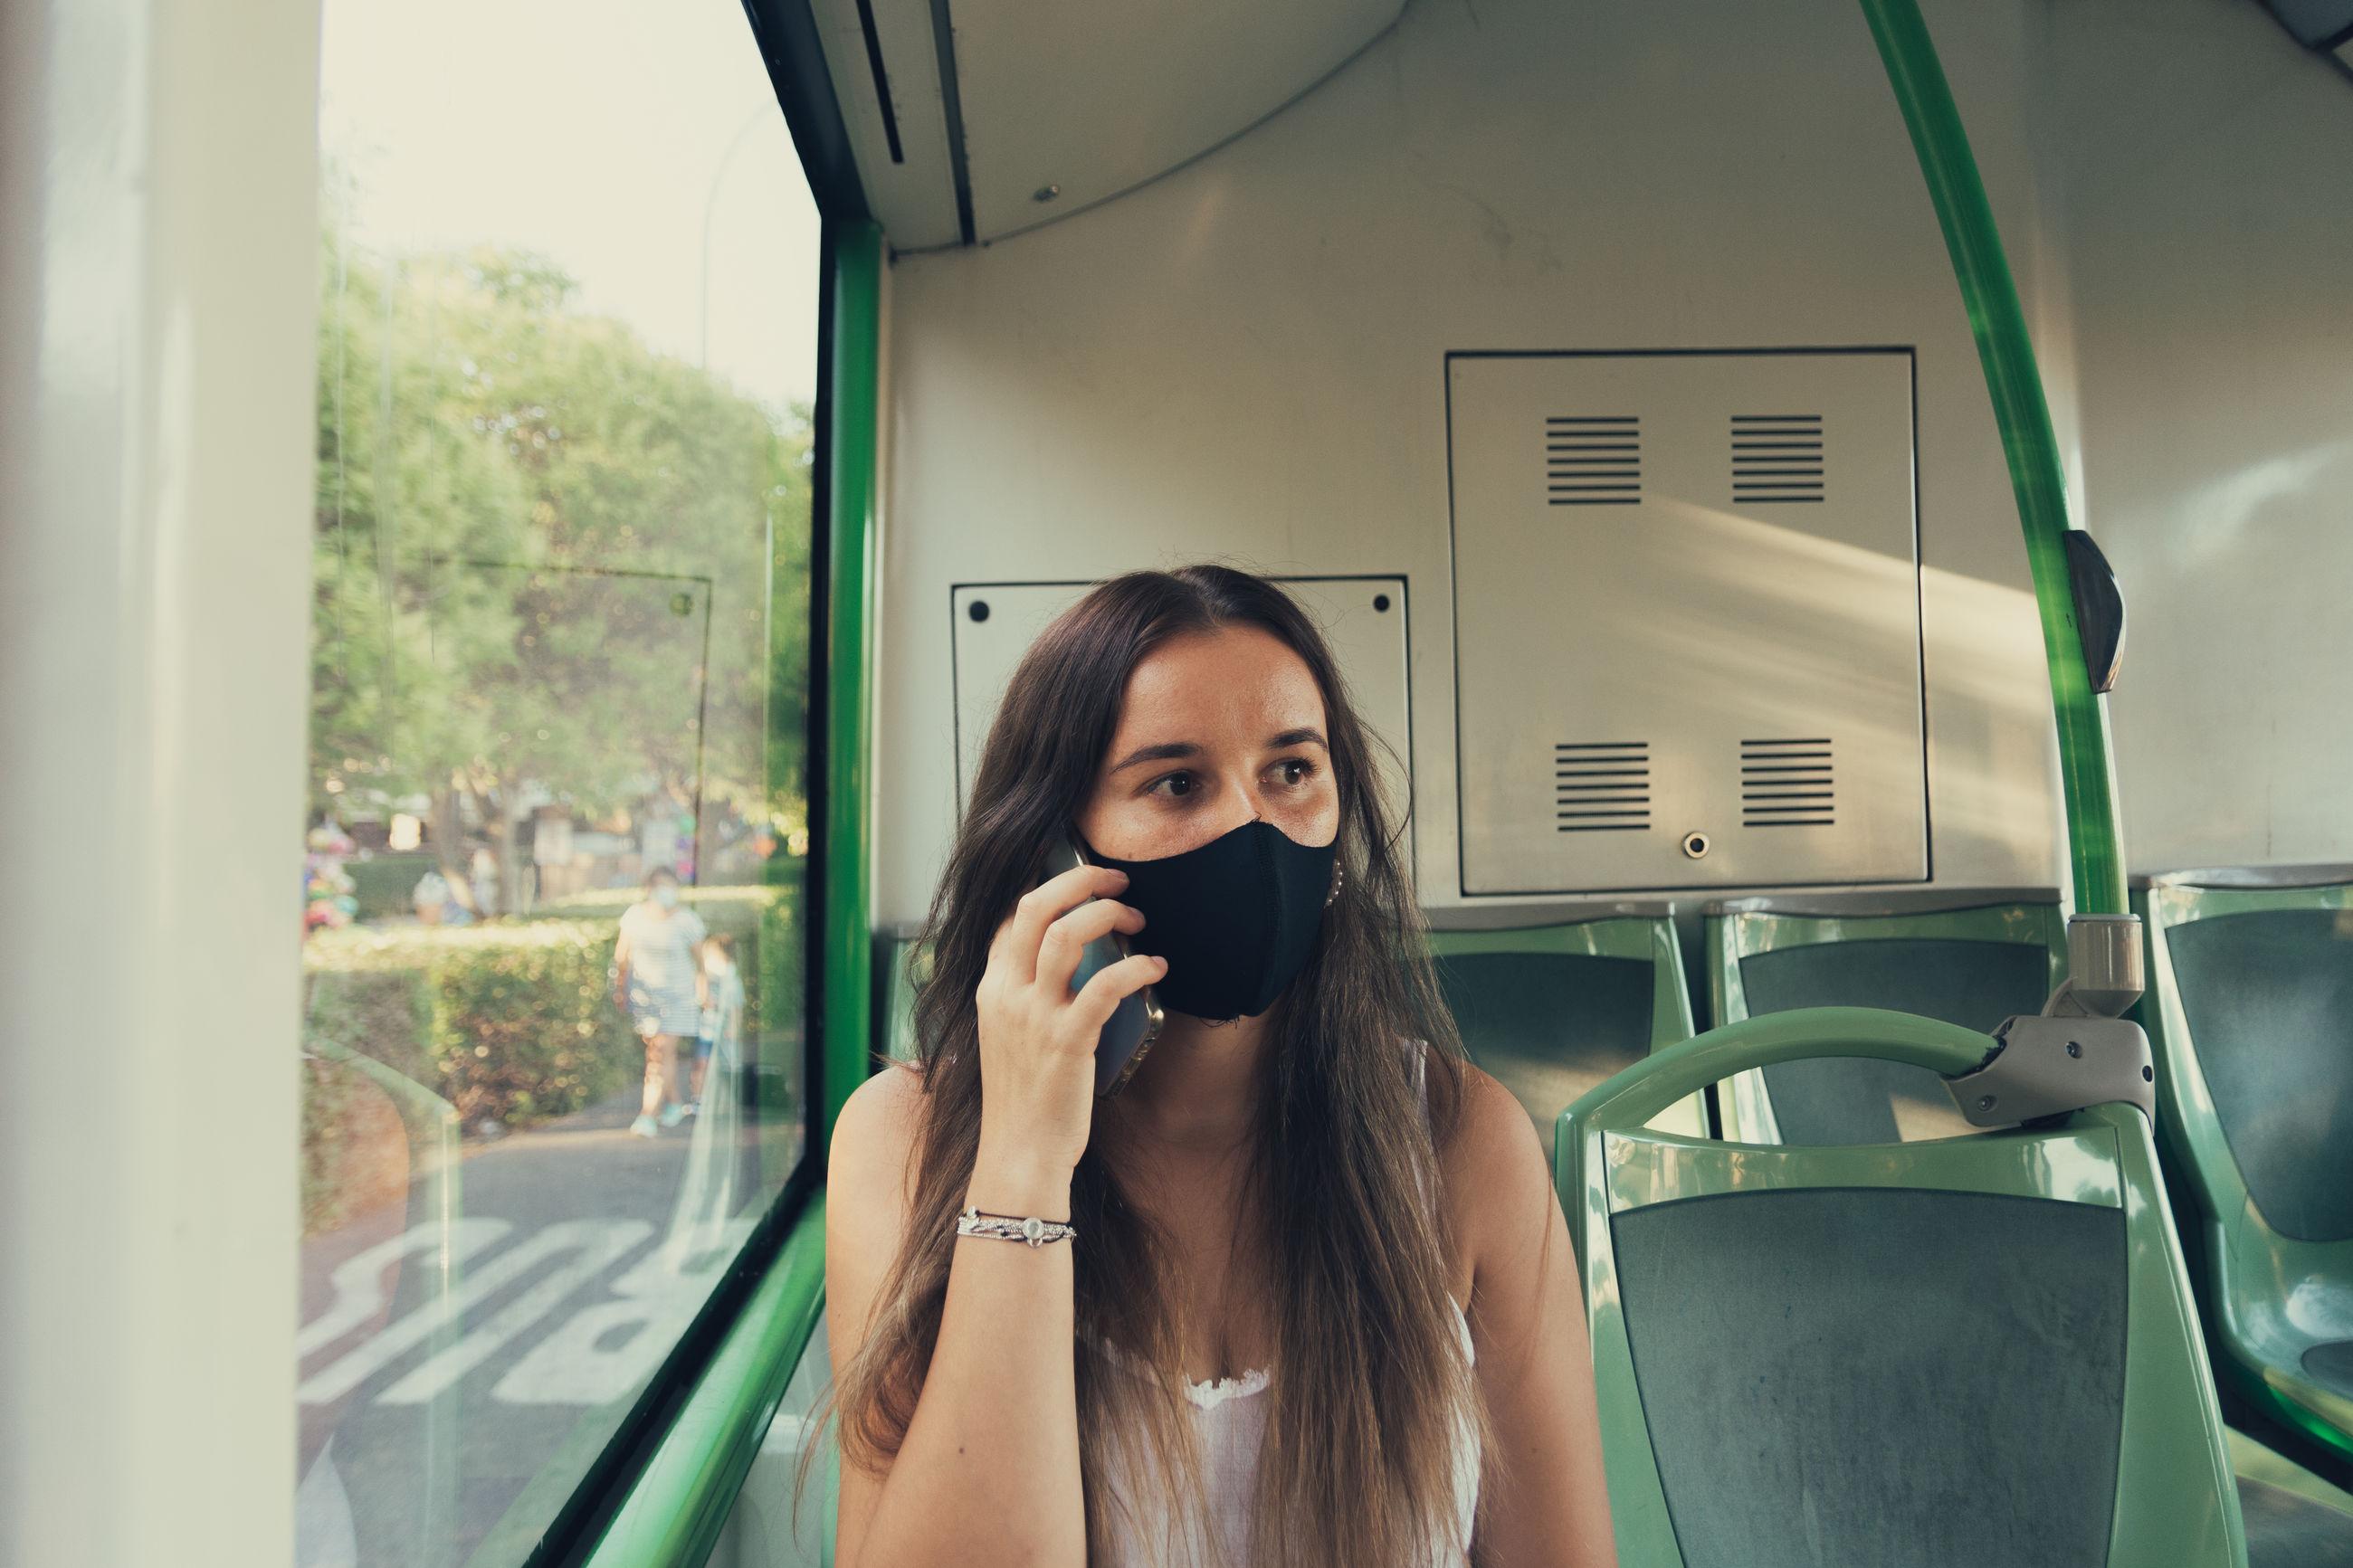 Woman wearing mask sitting in bus